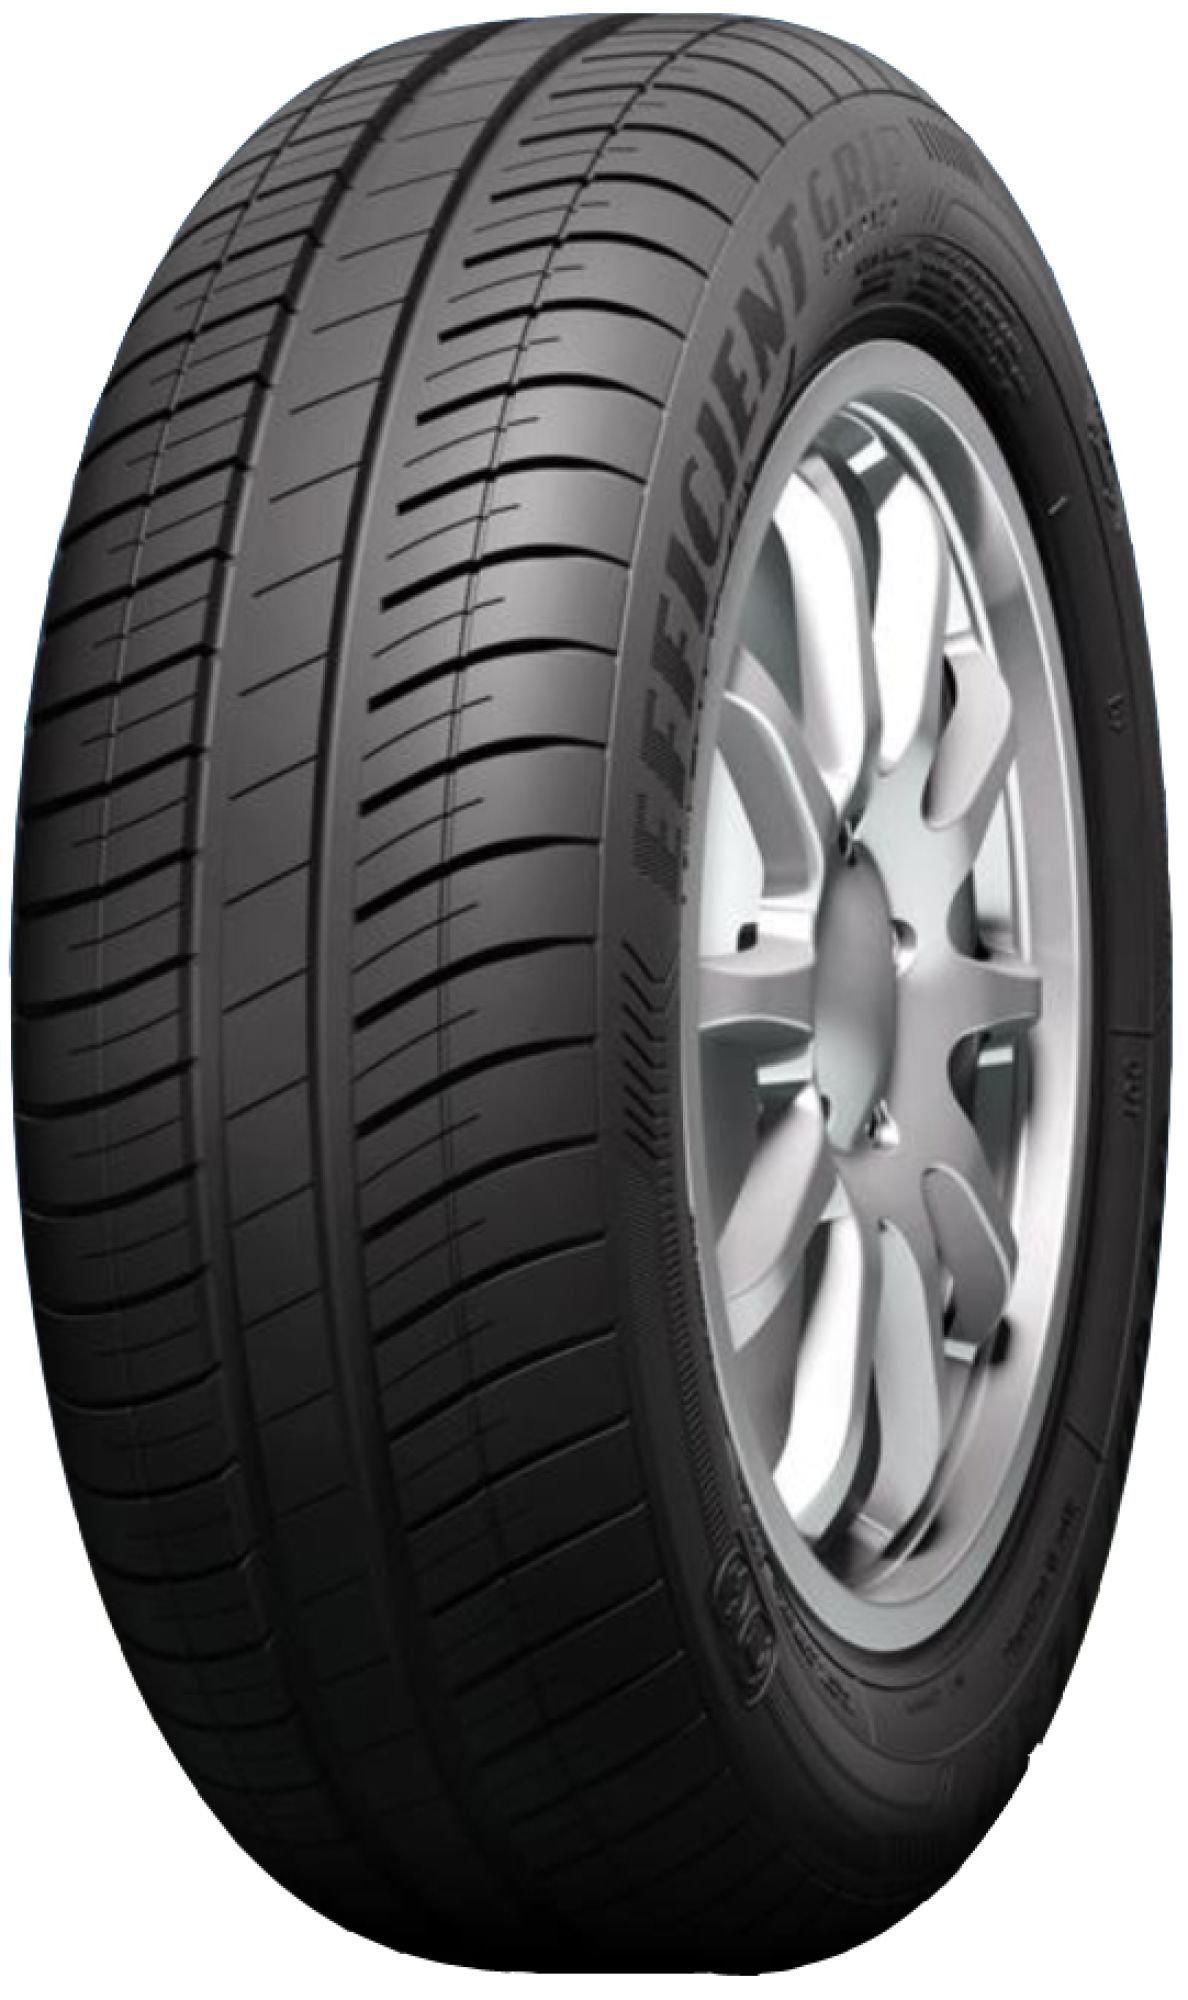 Neumático GOODYEAR EFFIGRIP COMPACT 155/70R13 75 T